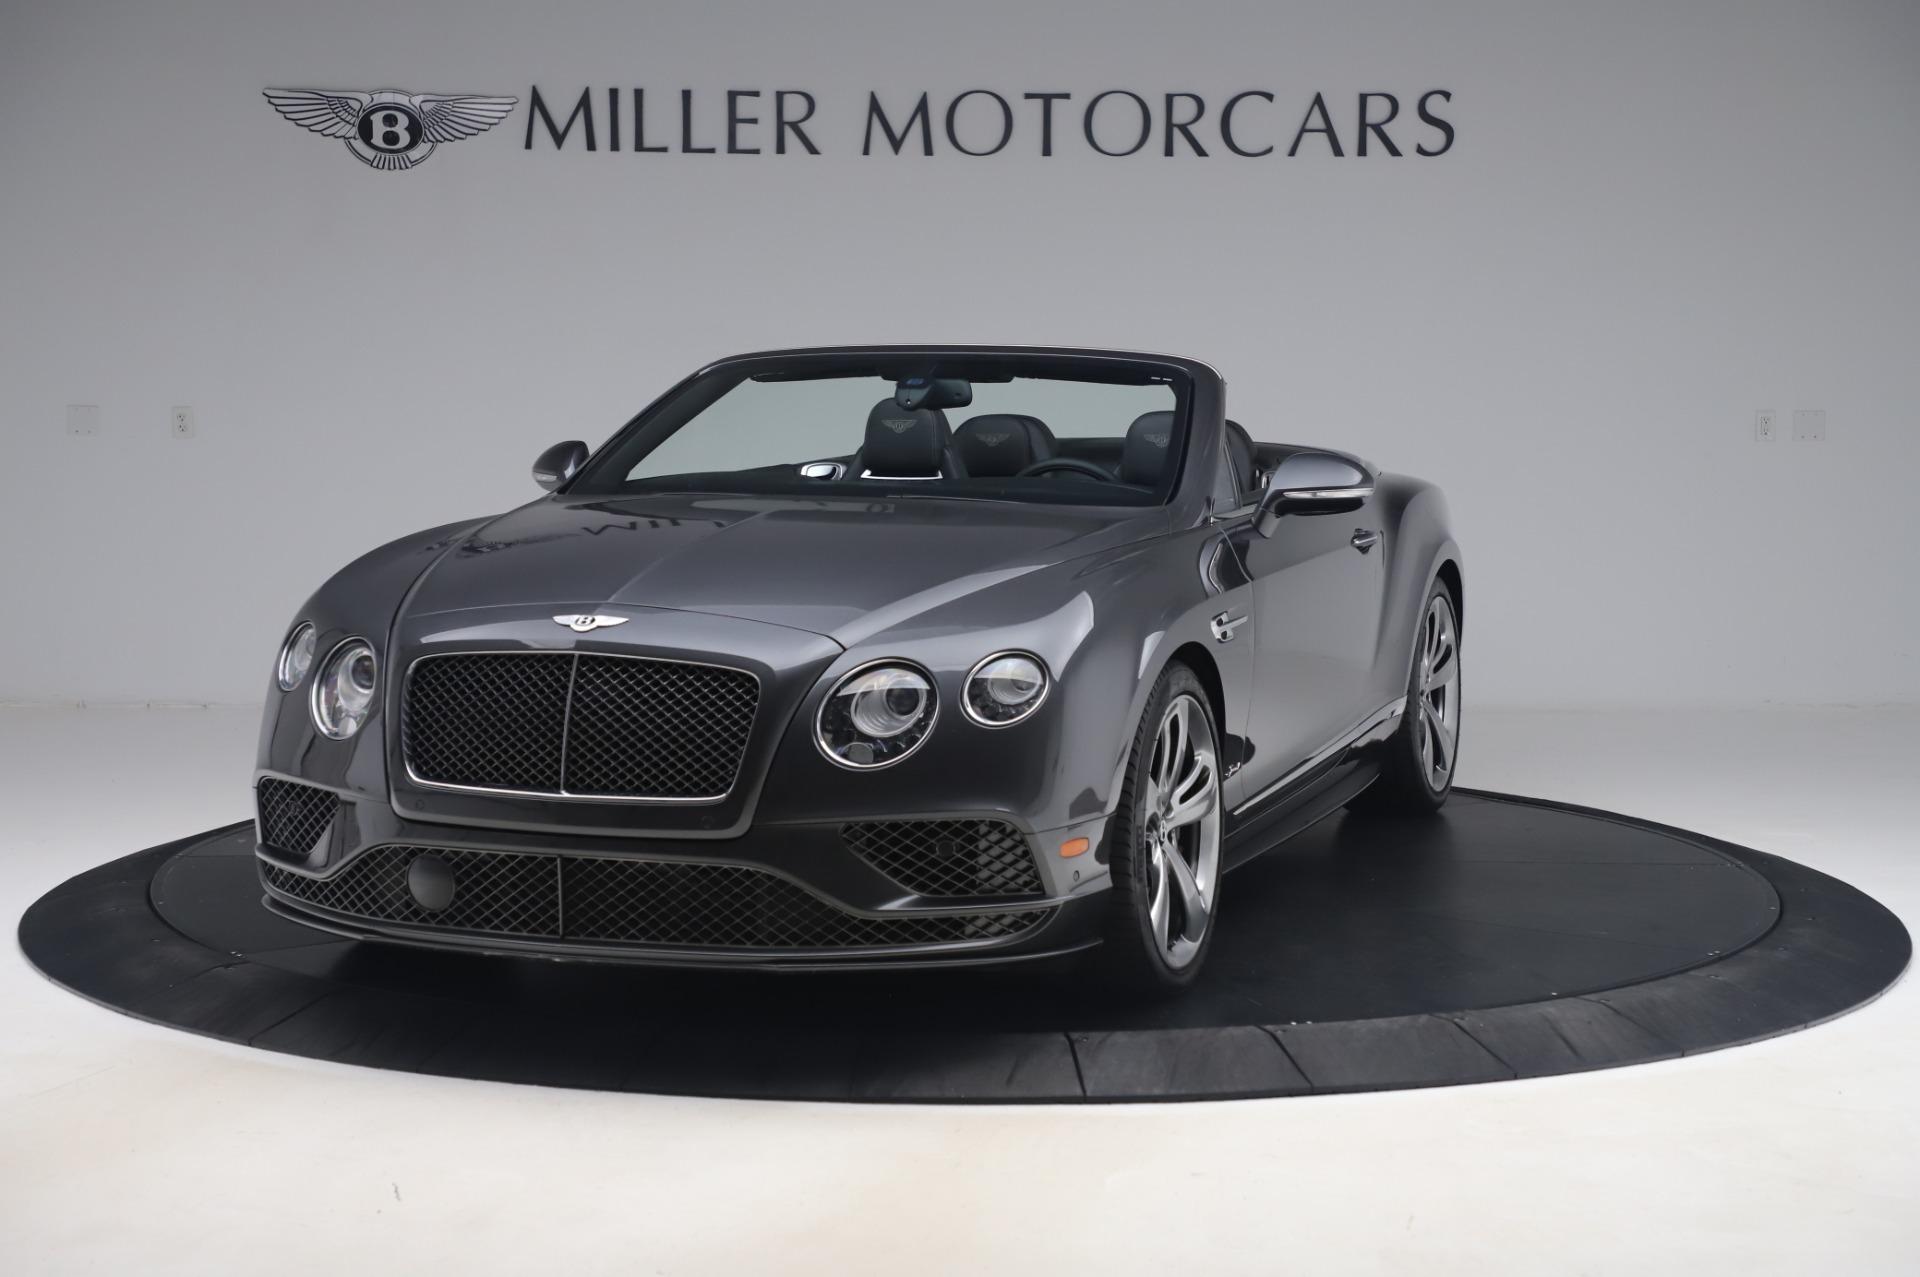 Used 2016 Bentley Continental GT Speed for sale $139,900 at Maserati of Westport in Westport CT 06880 1